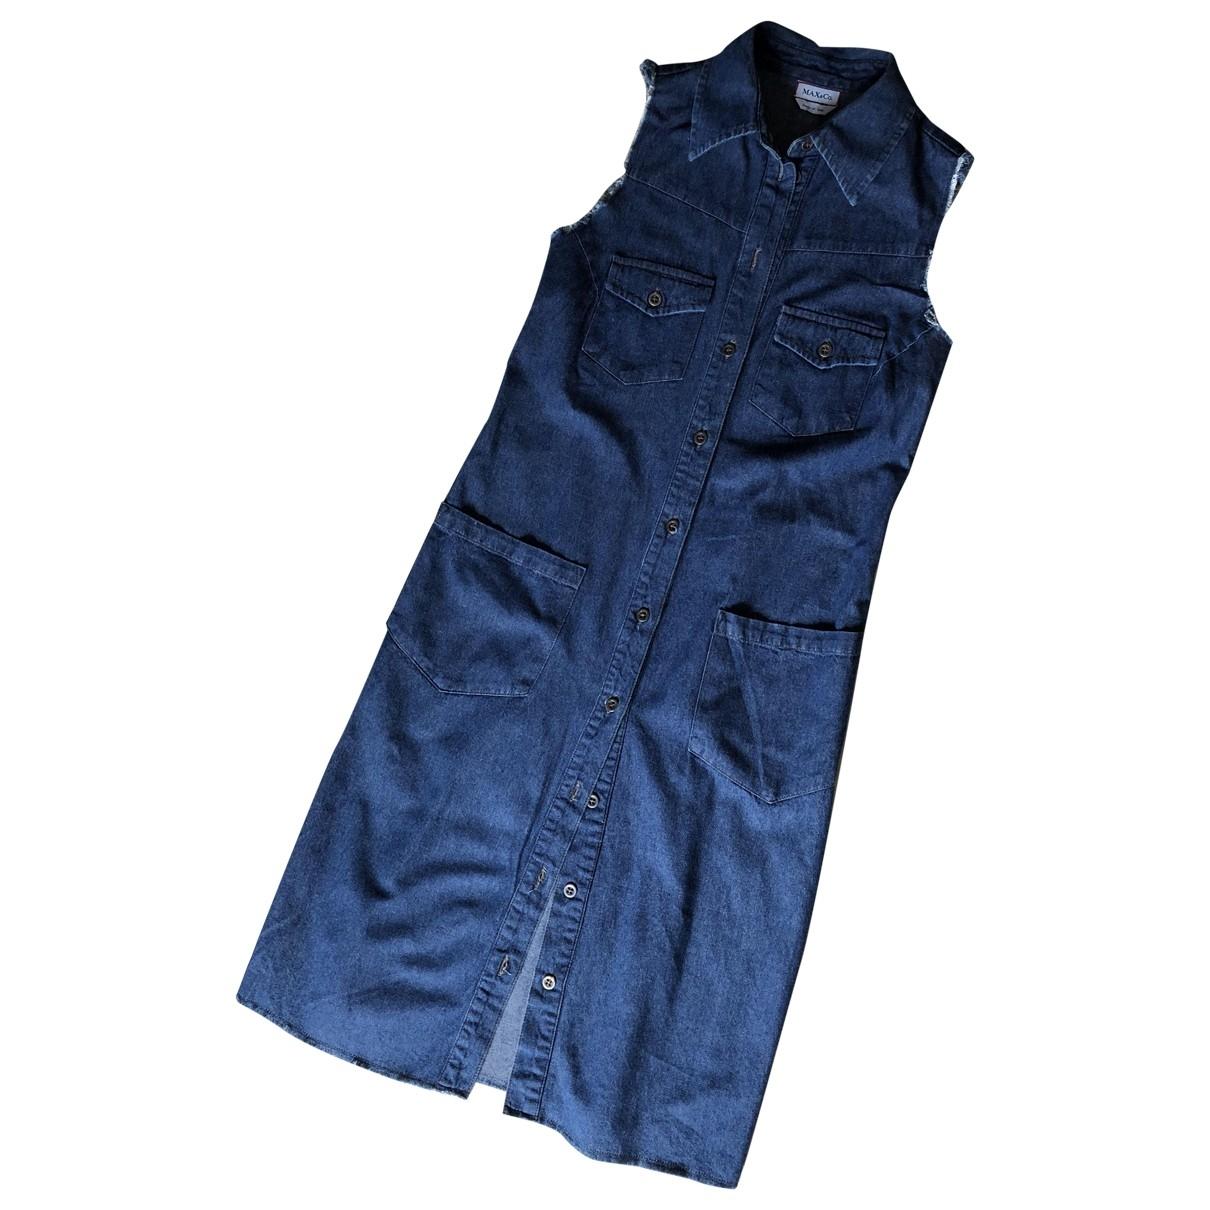 Max & Co \N Blue Cotton dress for Women 38 IT